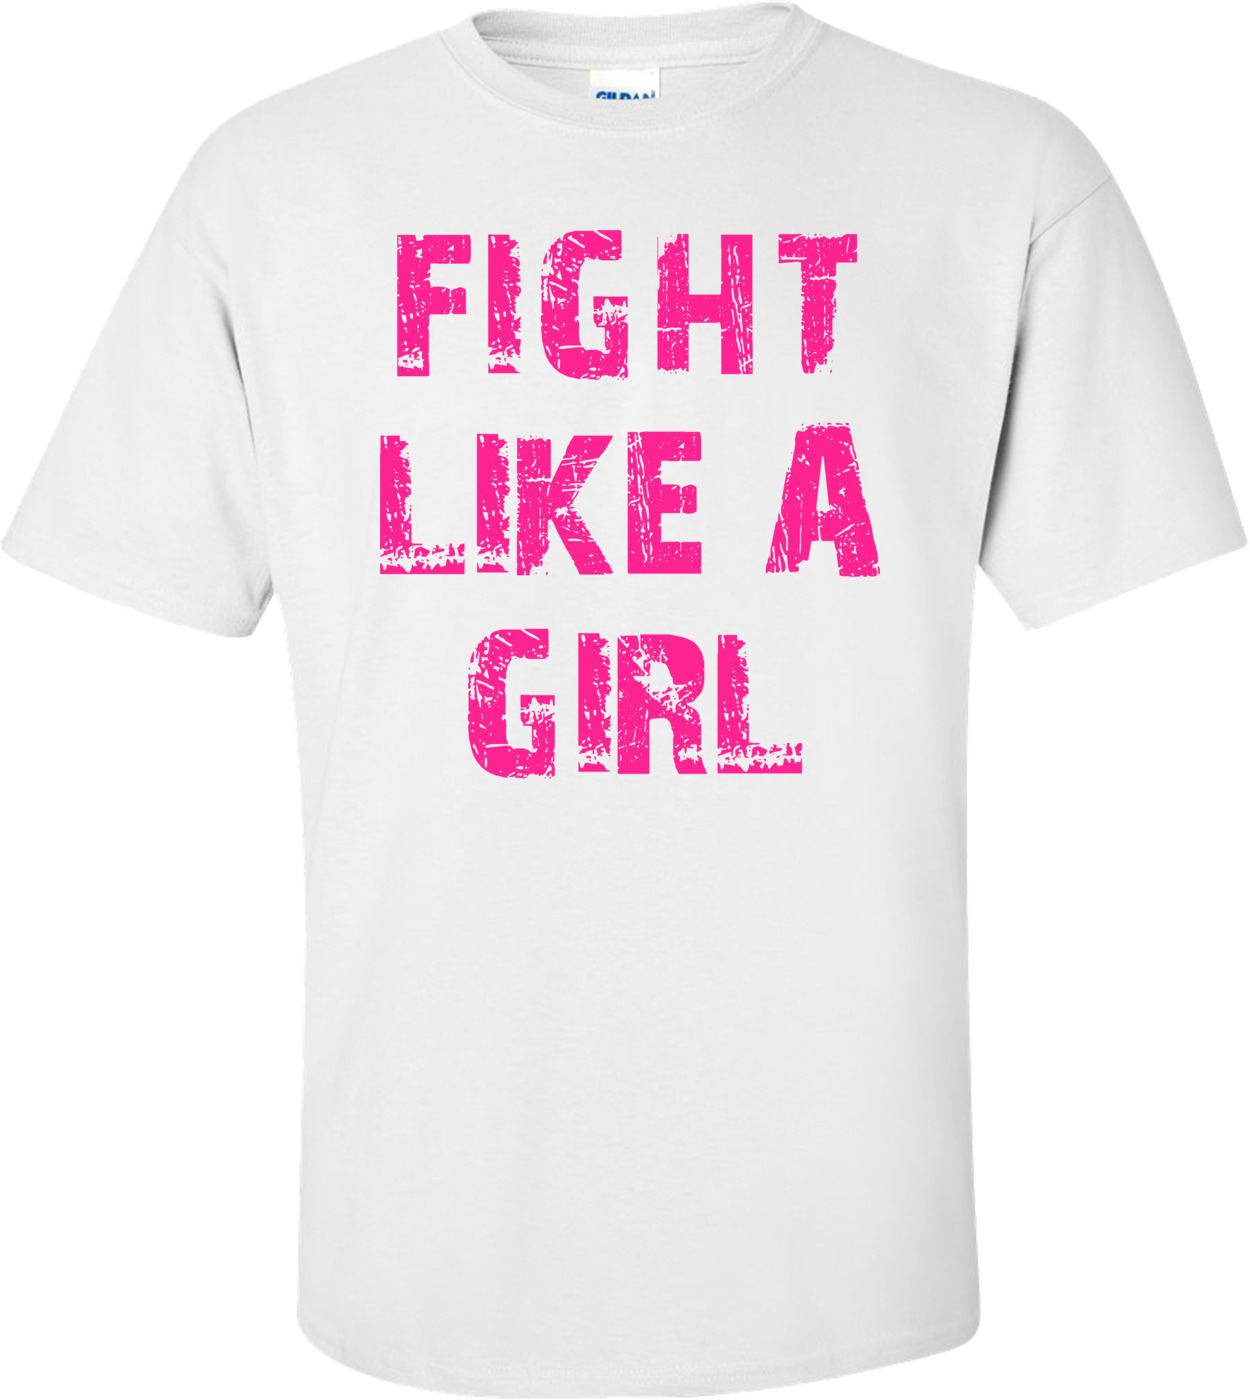 breast-cancer-fight-like-a-girl-shirt-3p.jpg e780243d0